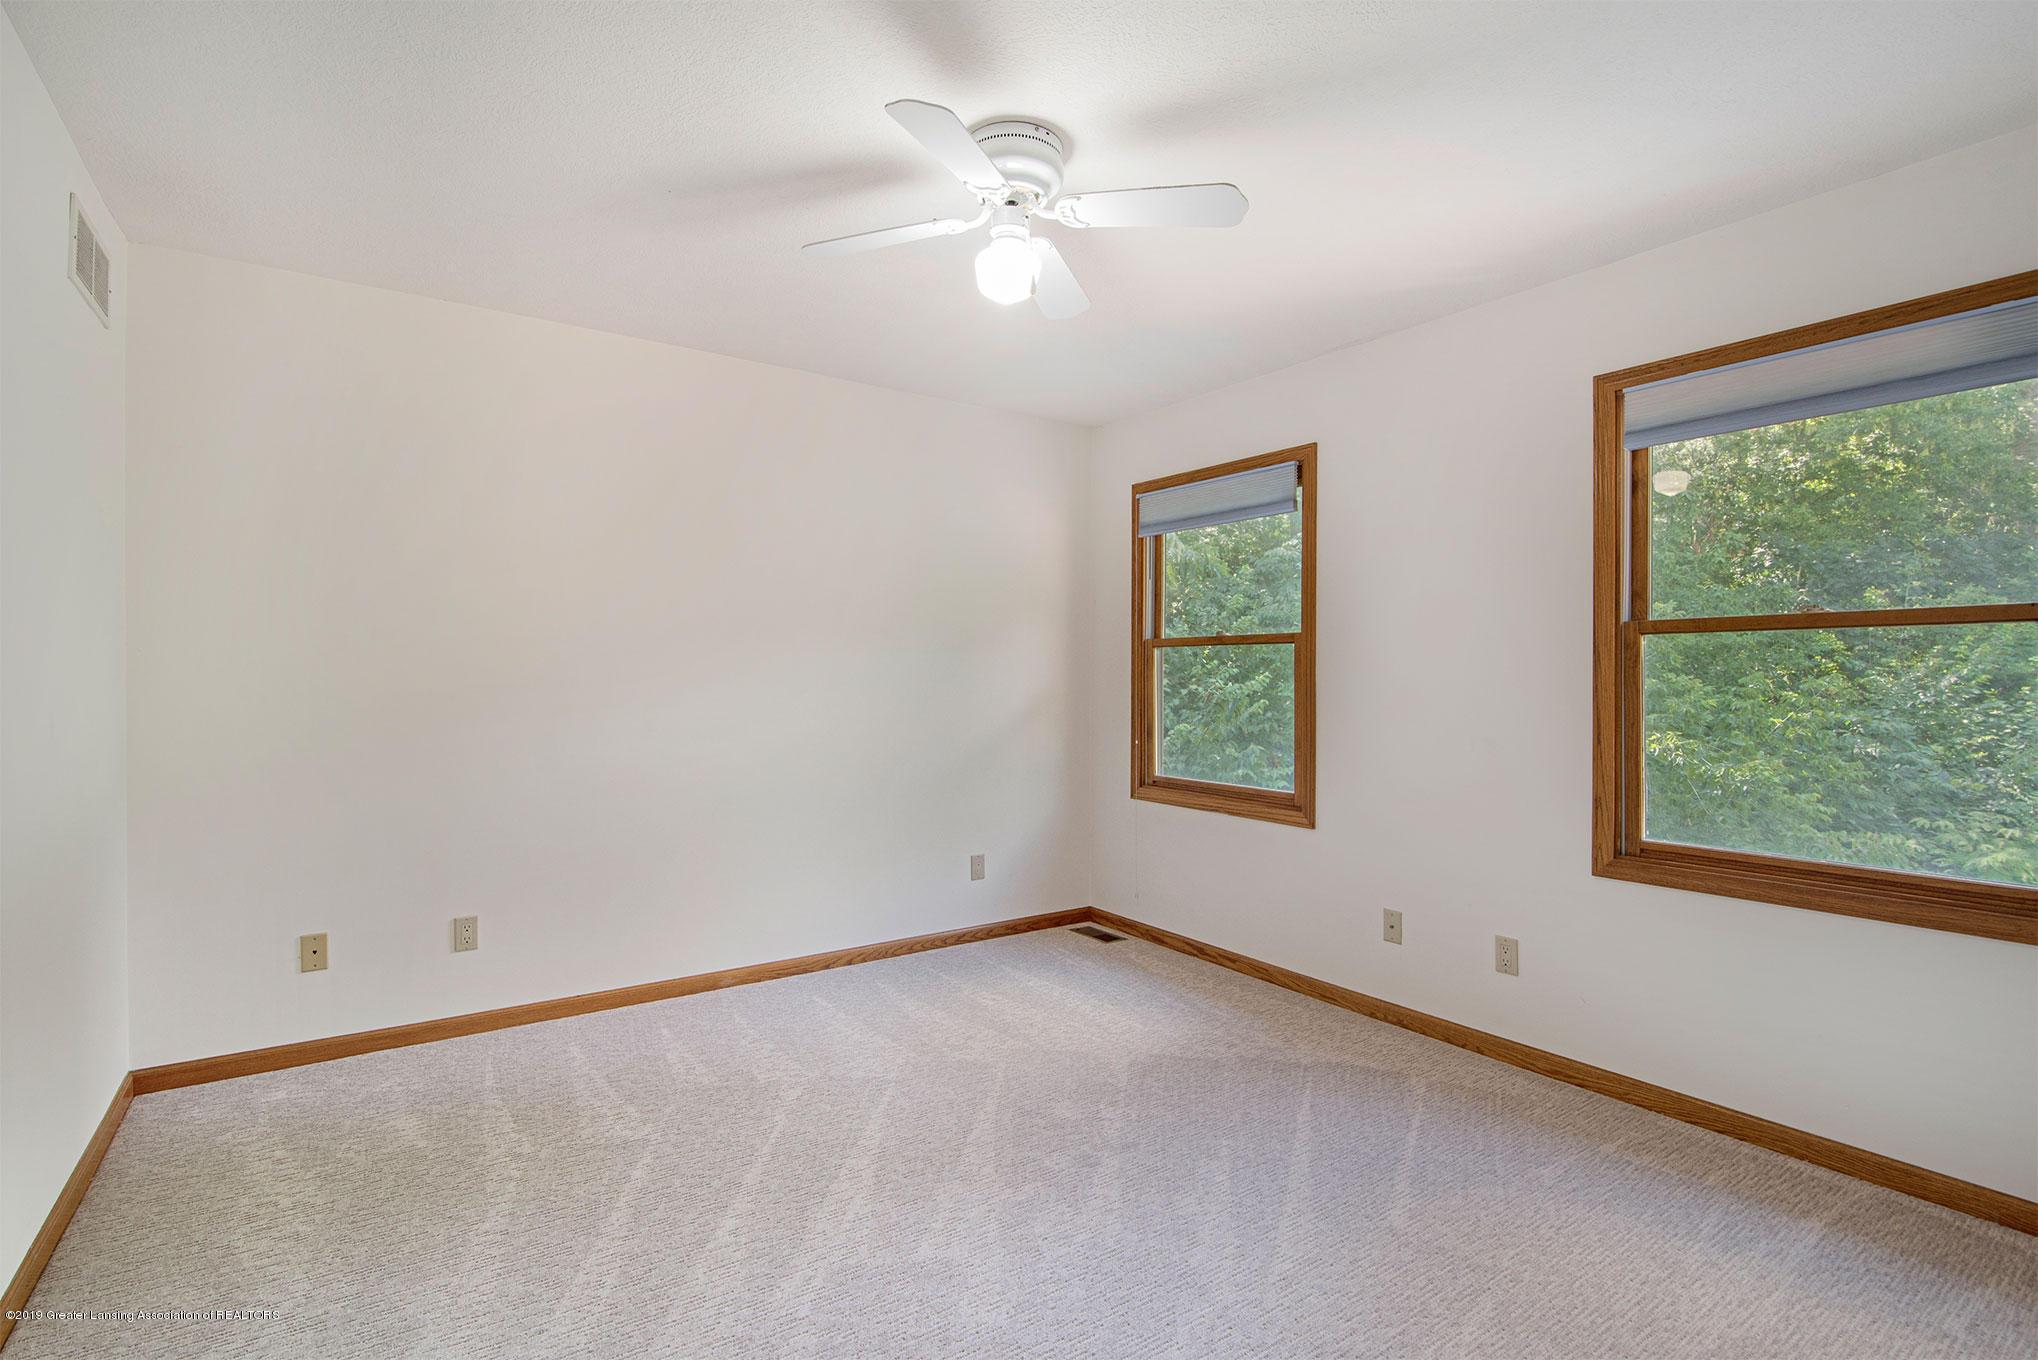 4341 Heartwood Rd - Bedroom - 30